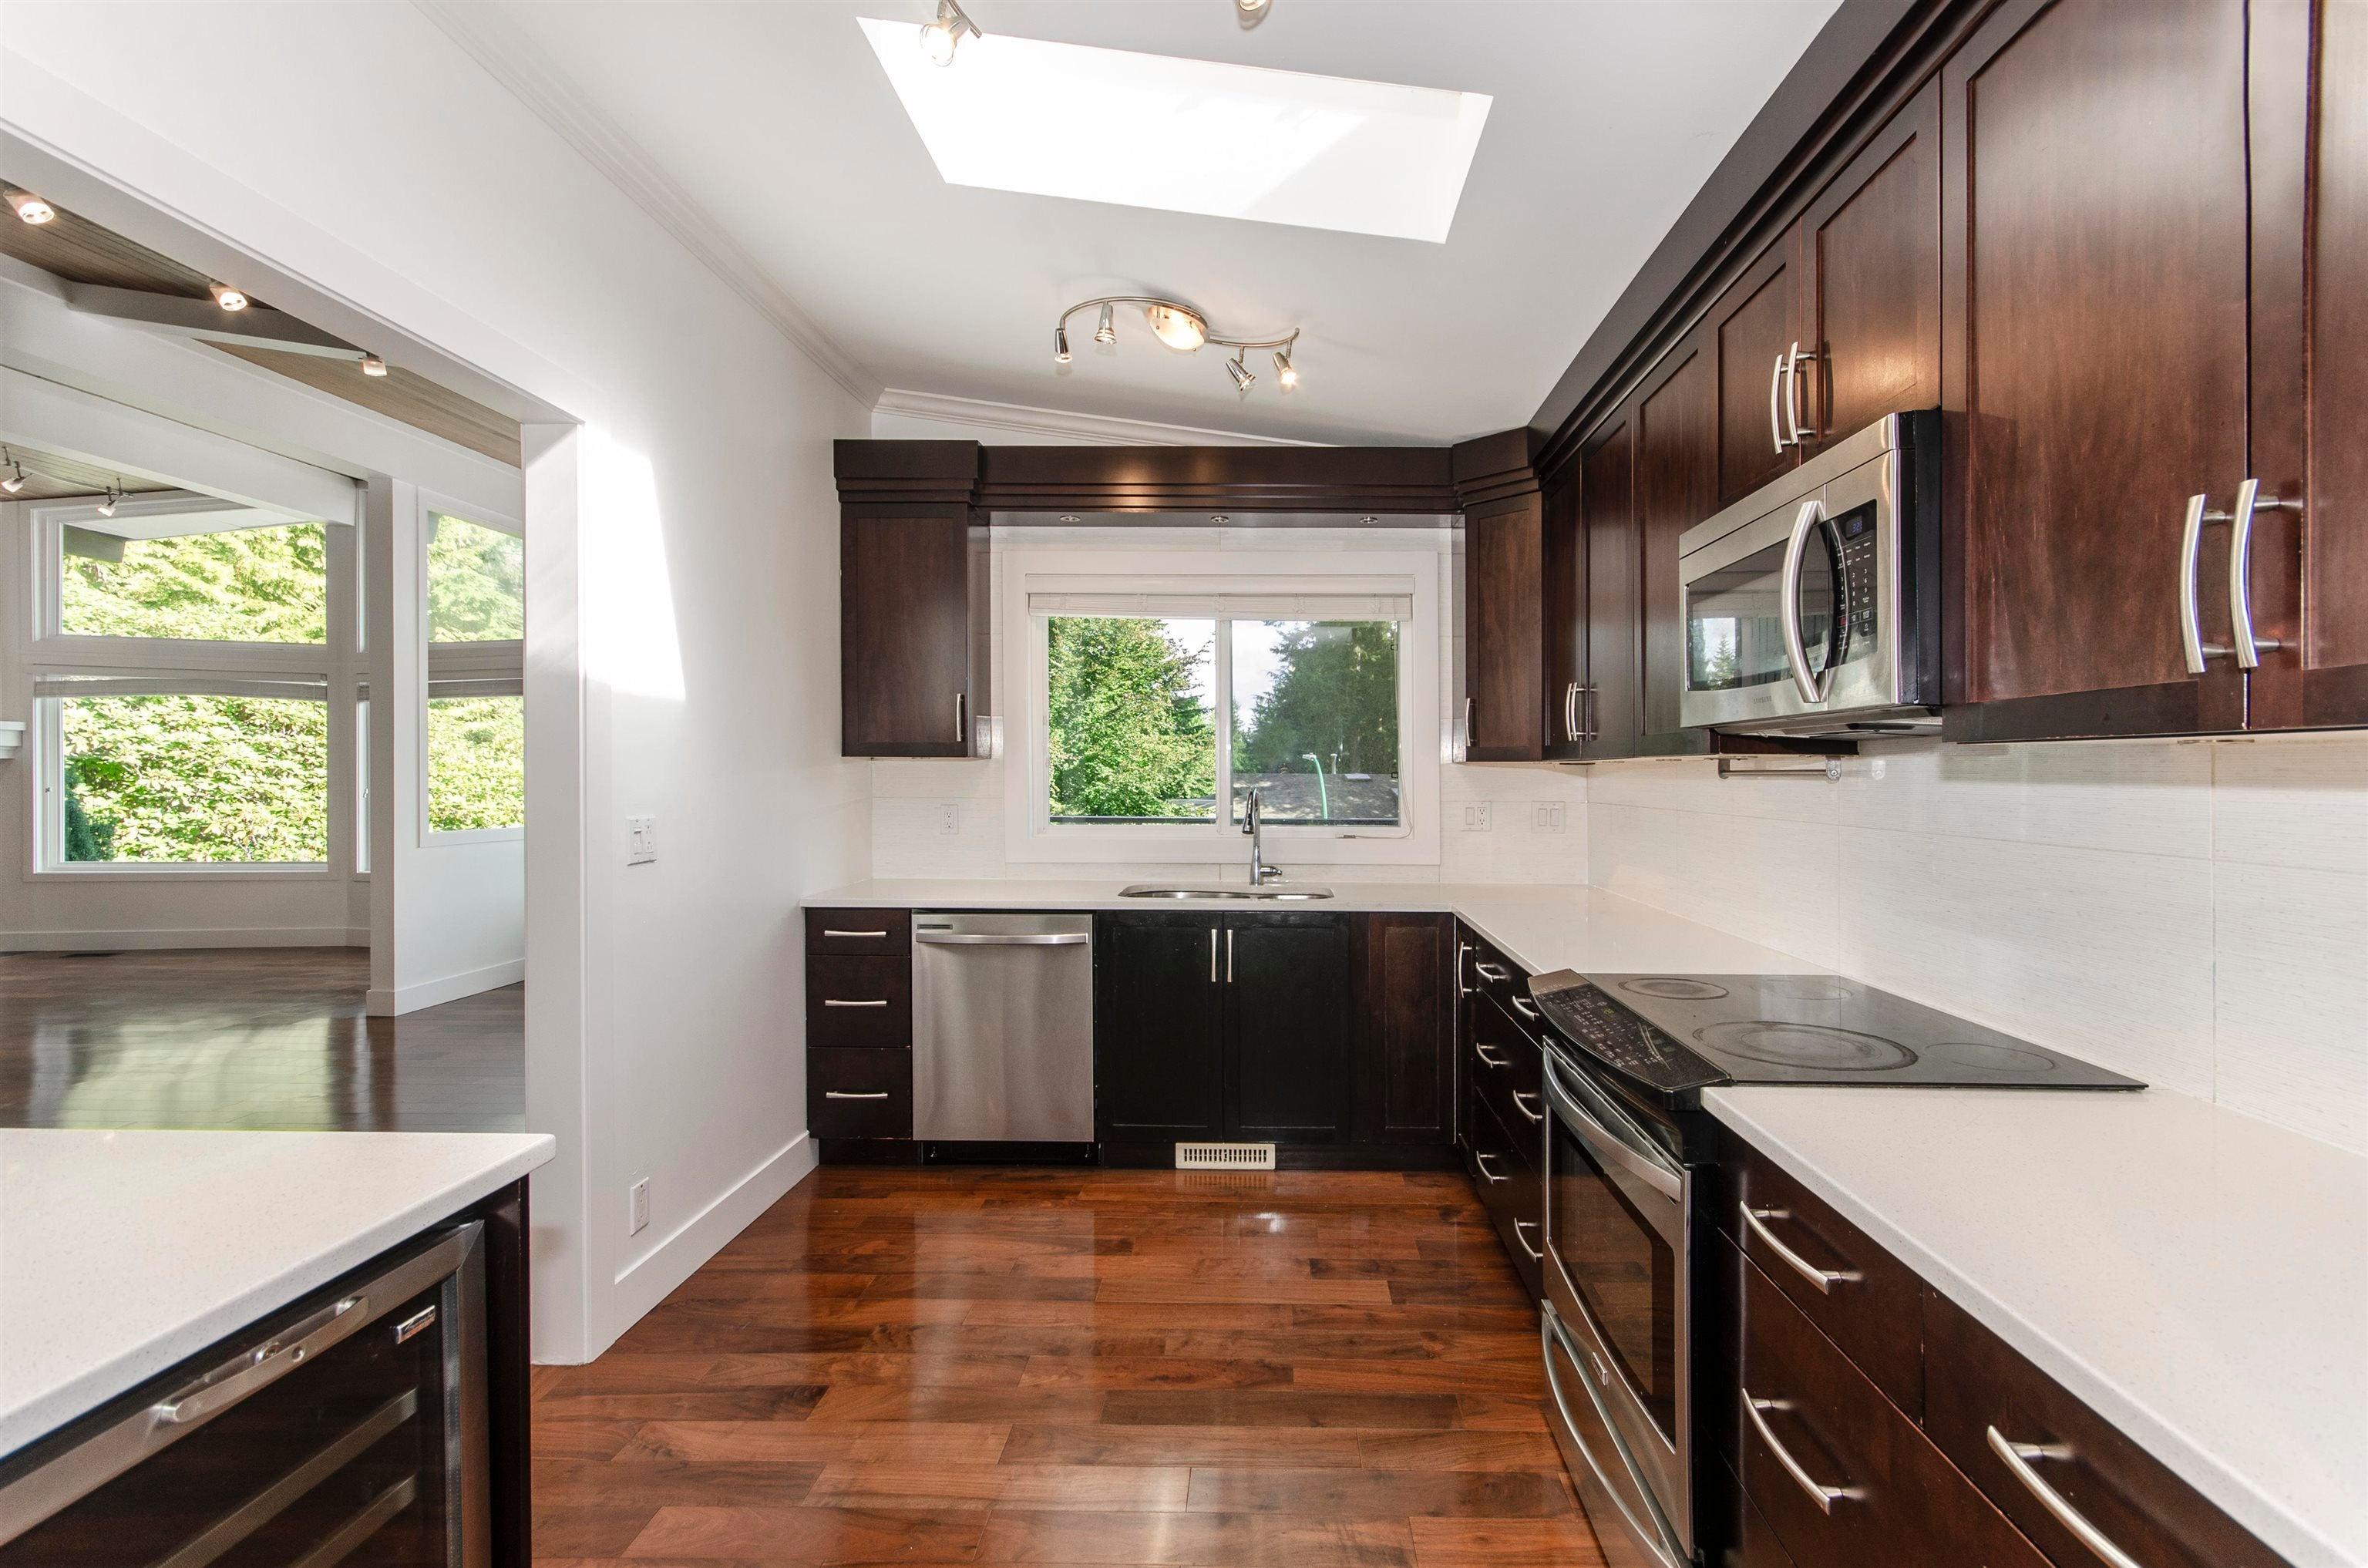 3785 REGENT AVENUE - Upper Lonsdale House/Single Family for sale, 4 Bedrooms (R2617648) - #8